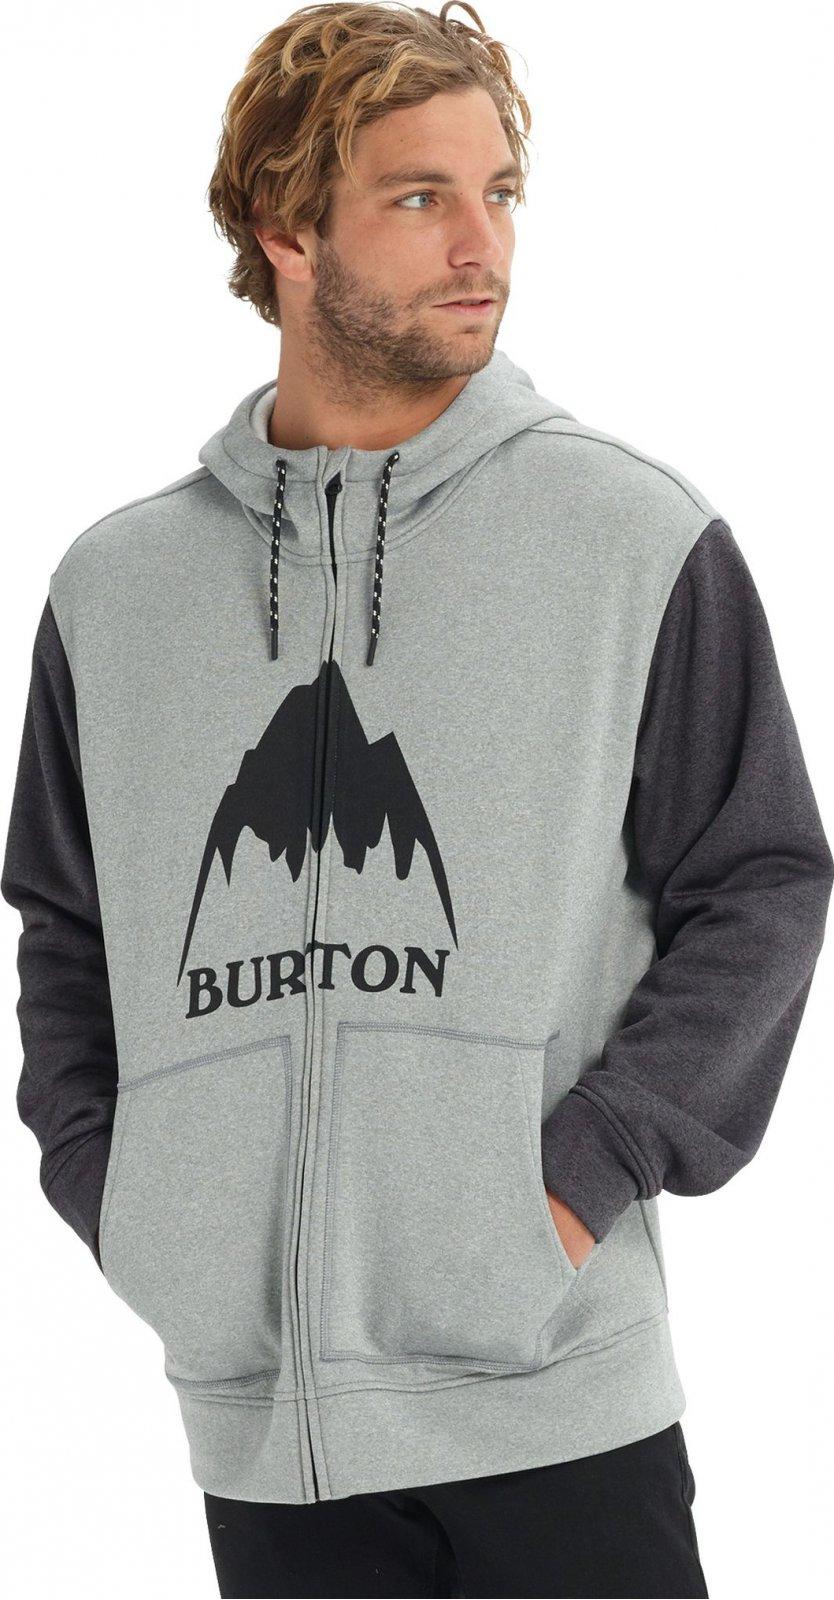 c68a3d0a5e Burton Mb Oak Fz 020 šedá od 1 456 Kč